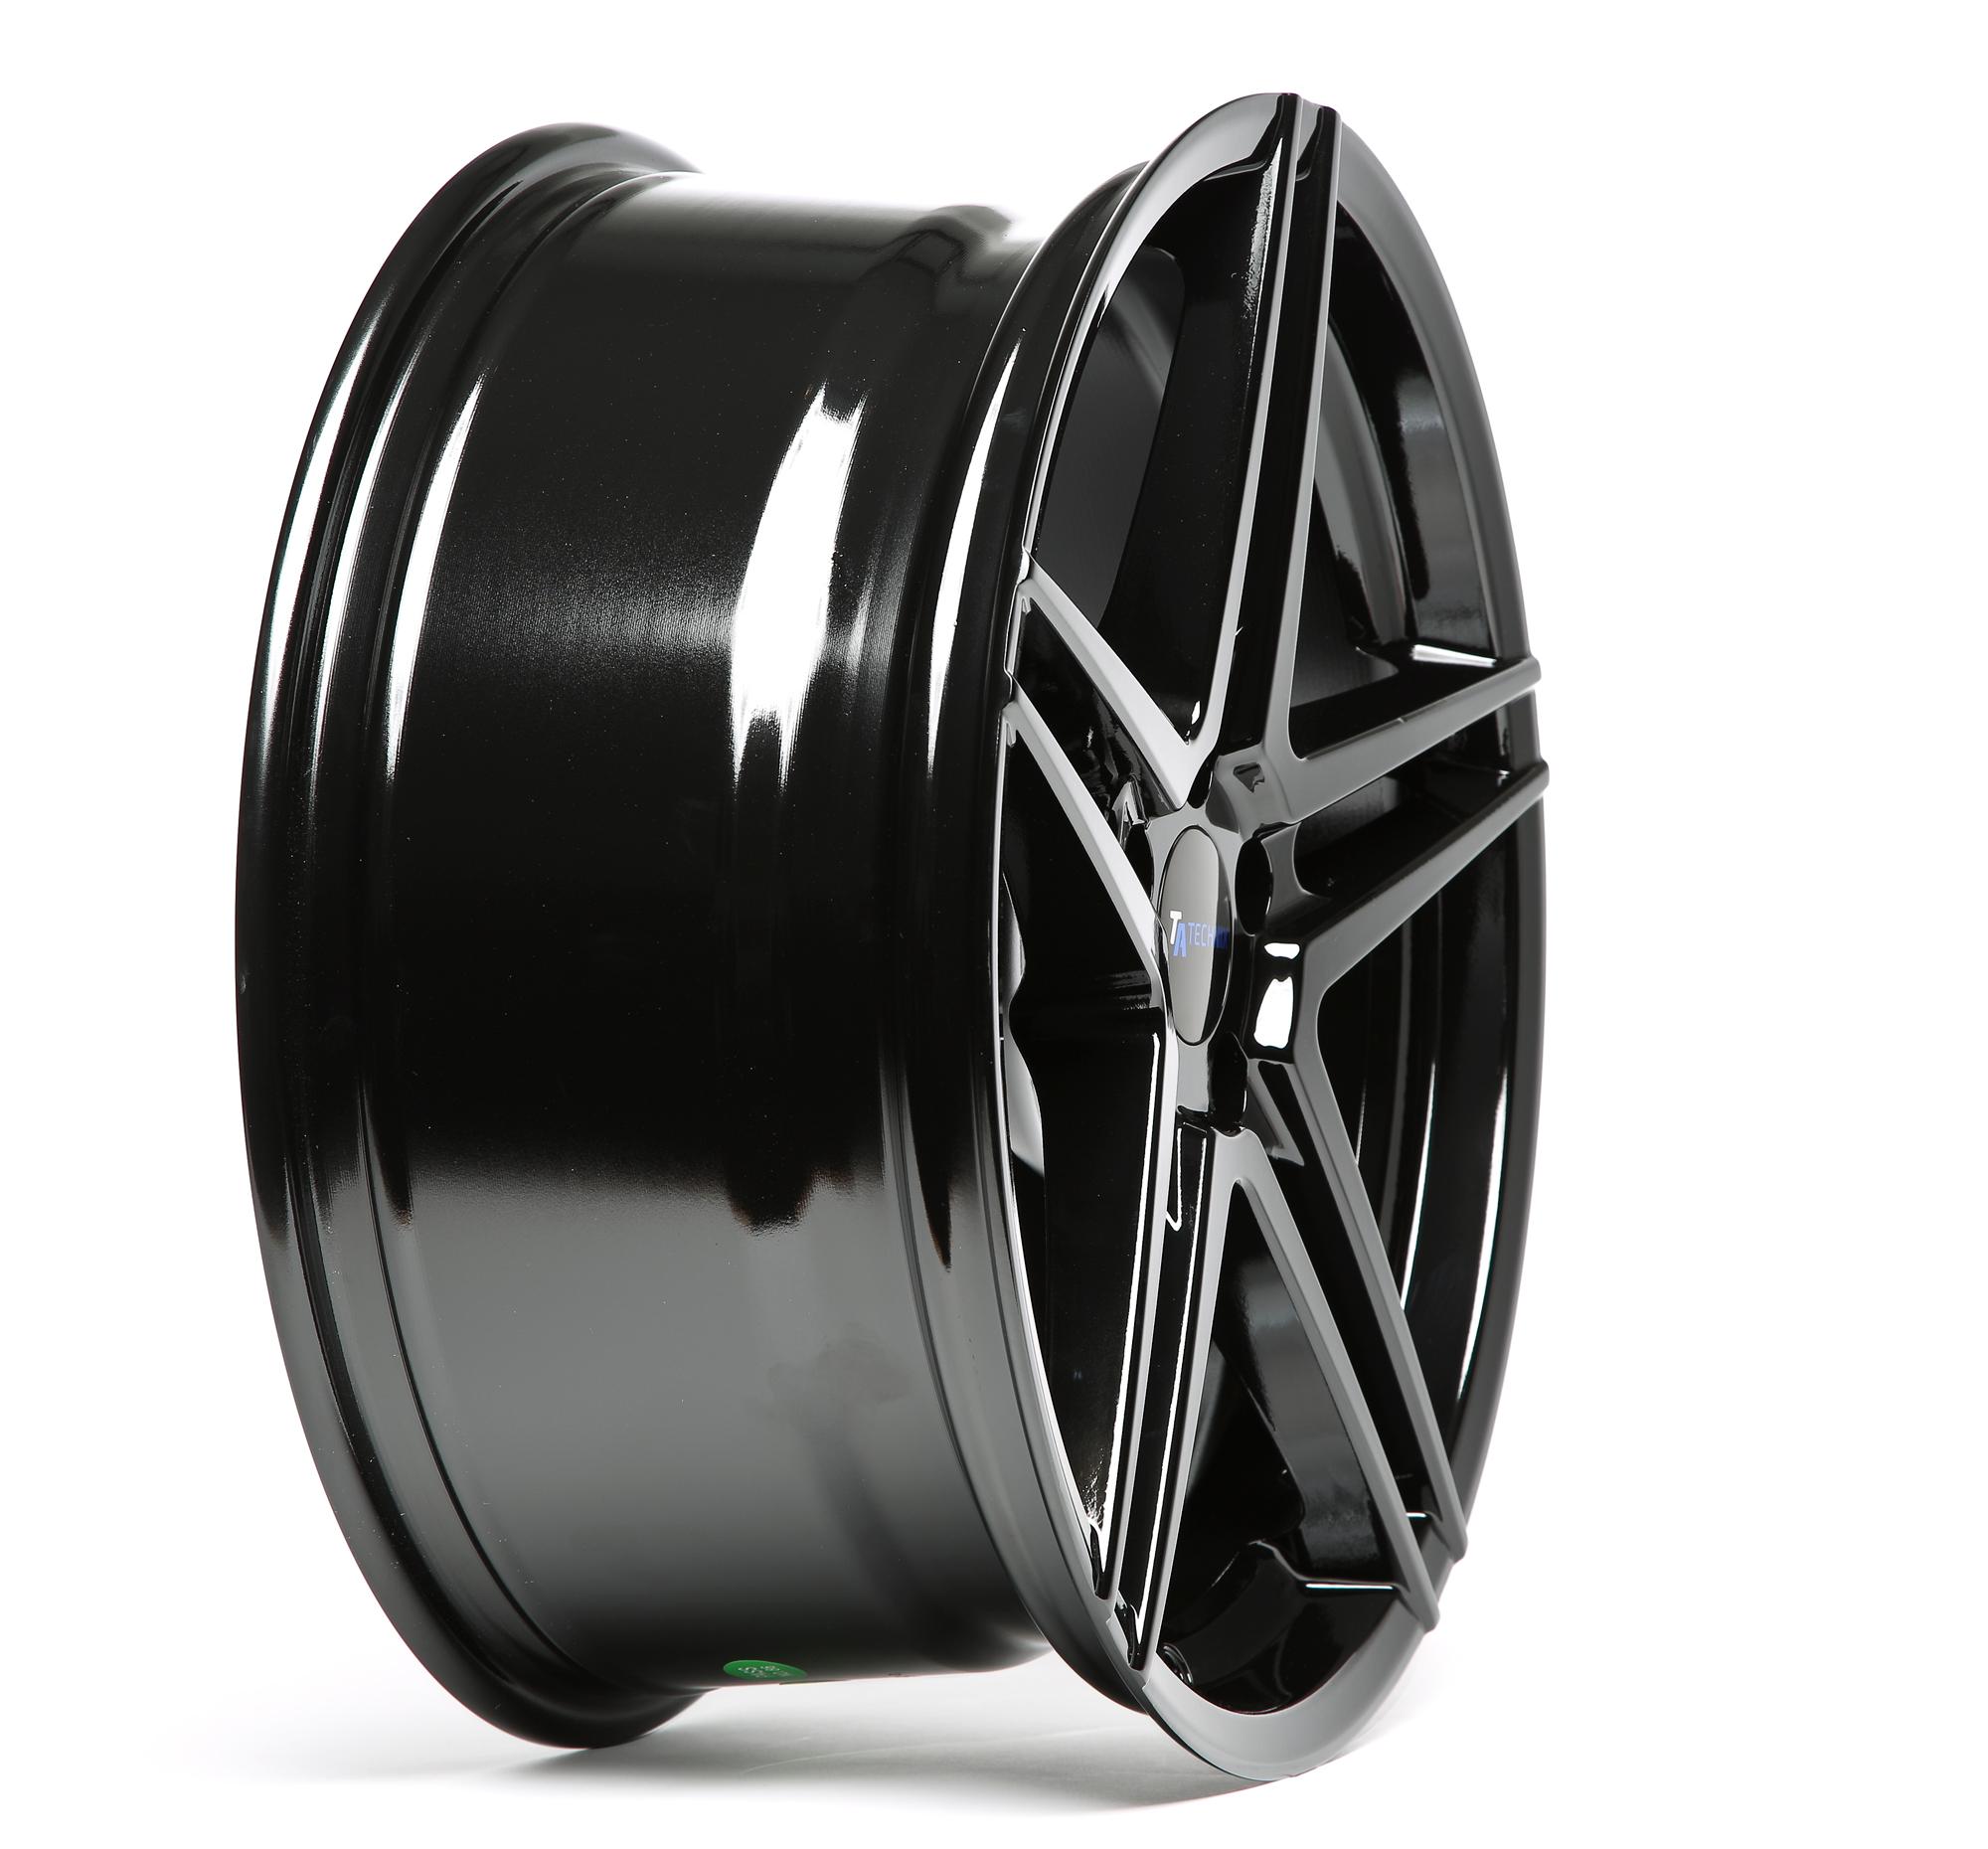 4x TA Technix Alufelge Felge 8,5x19 ET35 LK5x112 NLB 66,6 Bright Black Schwarz